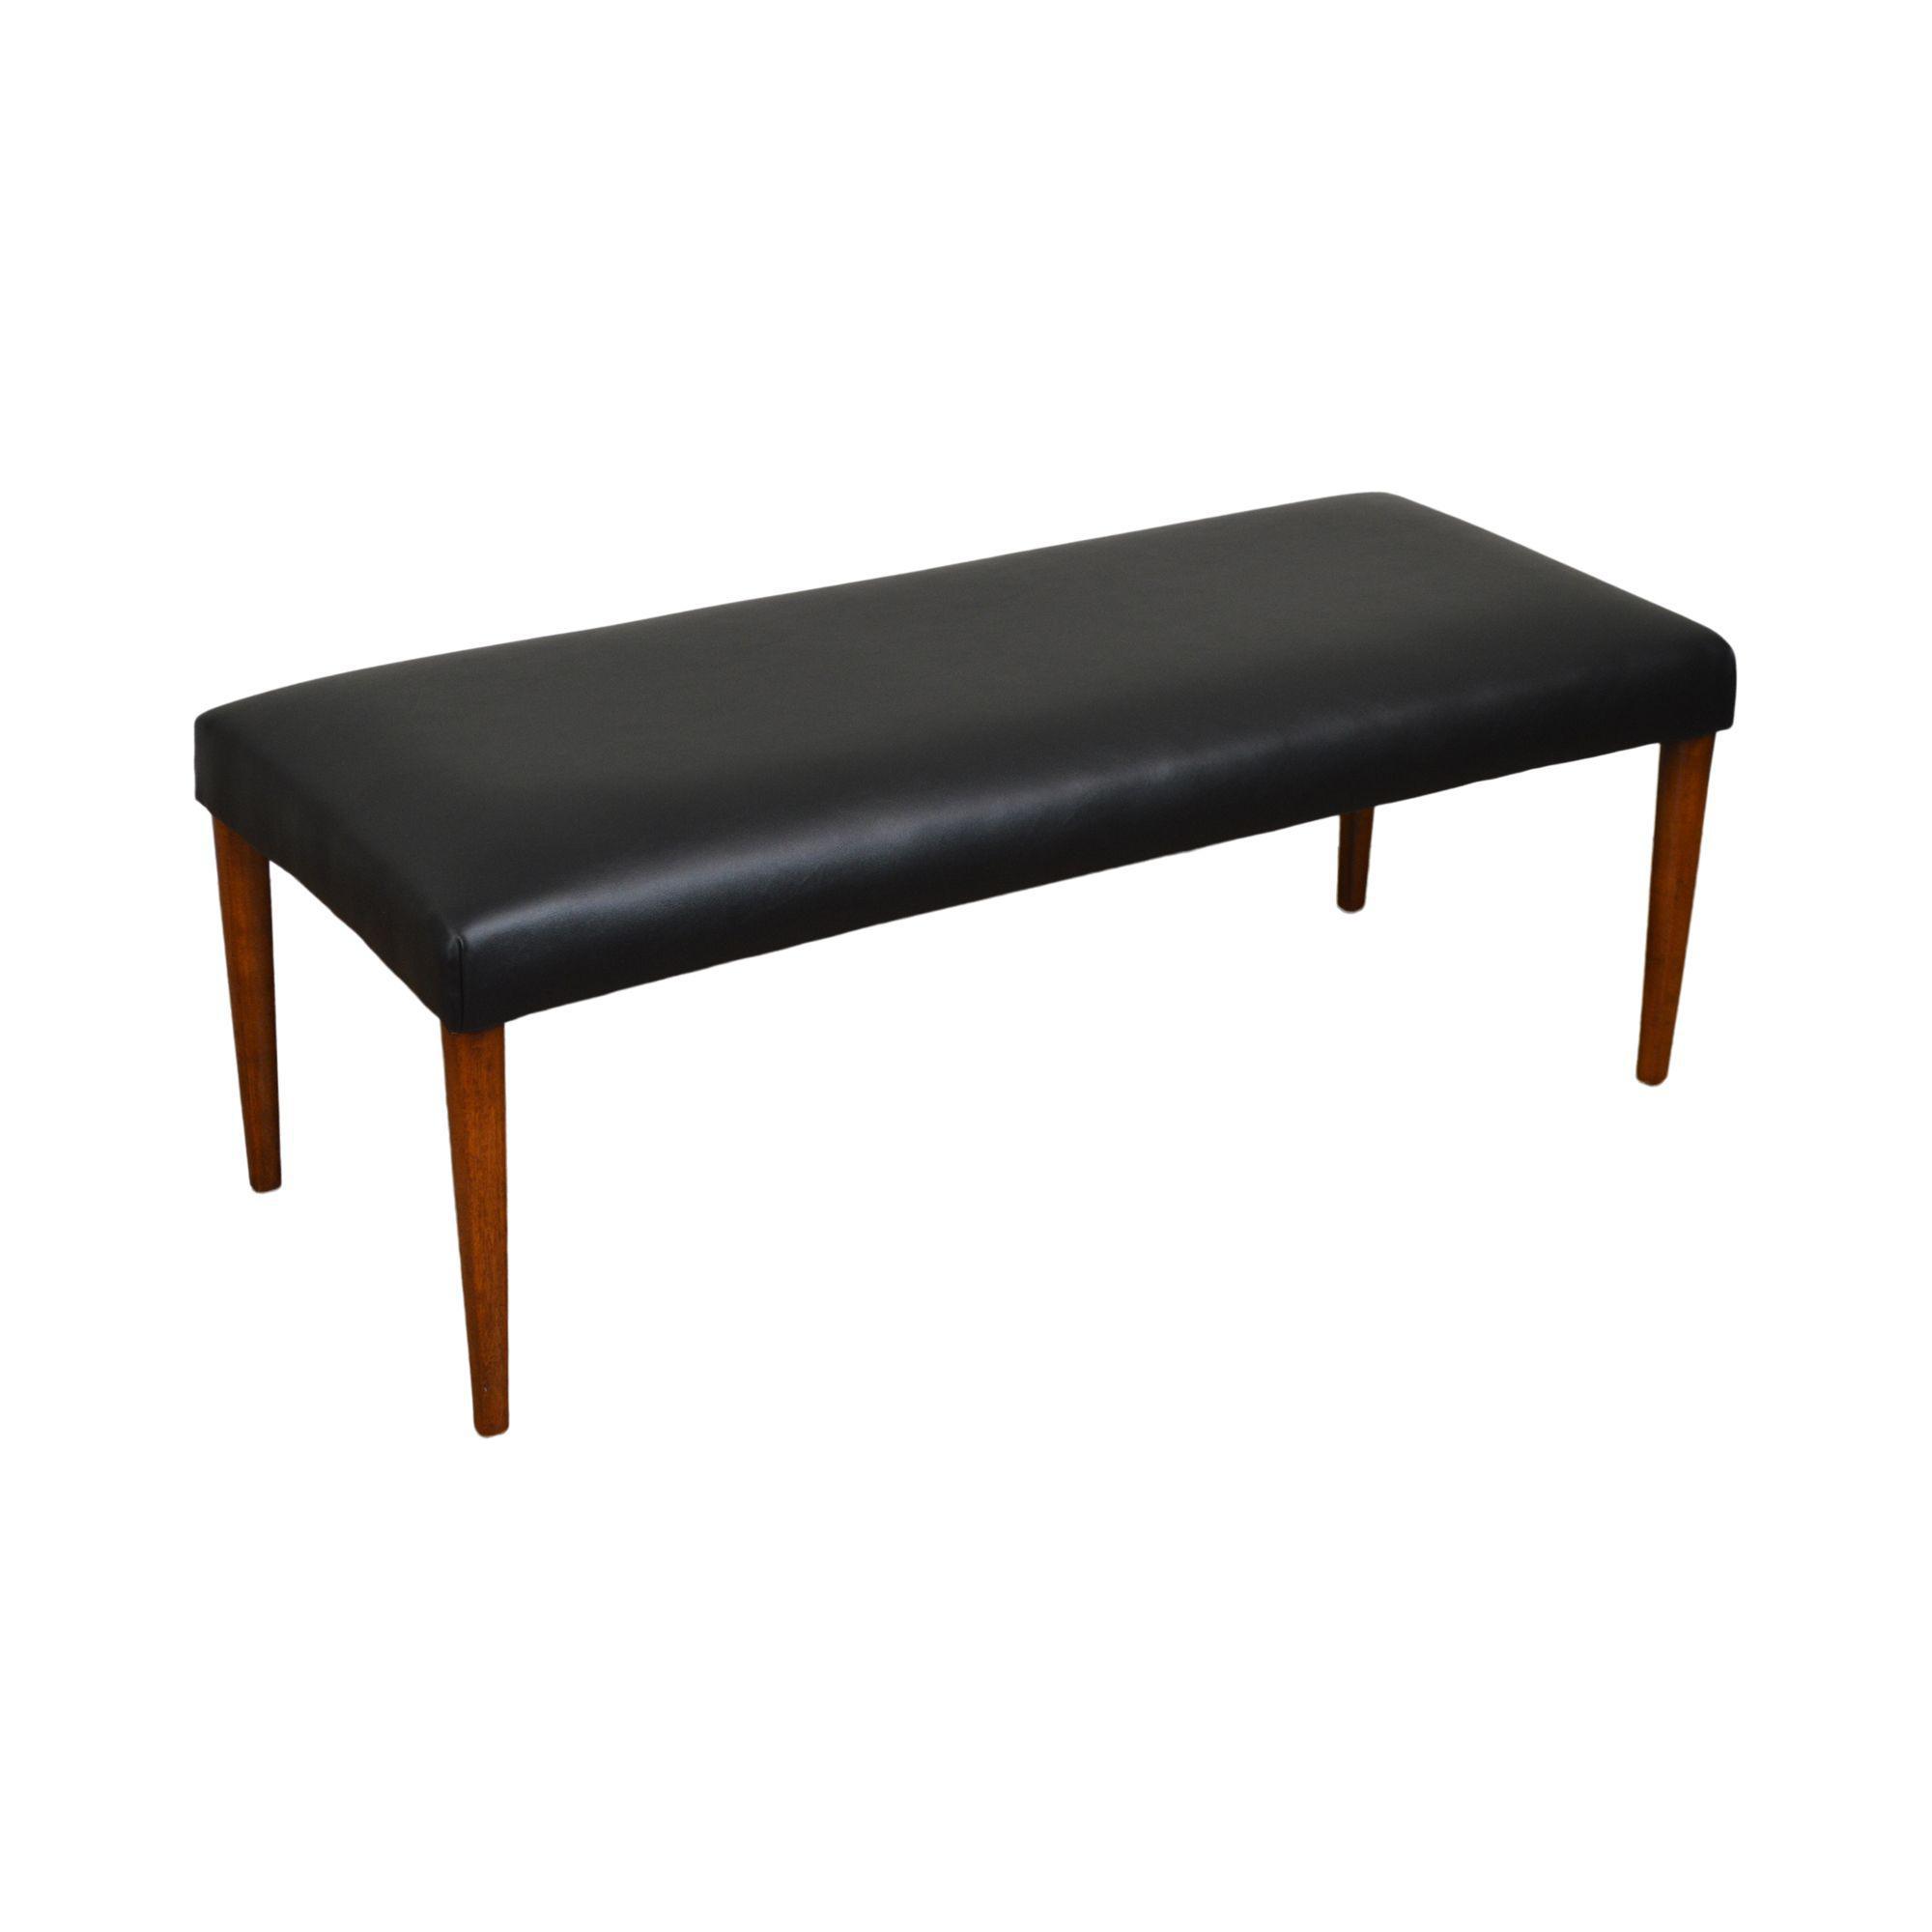 Image of: Danish Modern Mid Century Black Vinyl Seat Bench Chairish